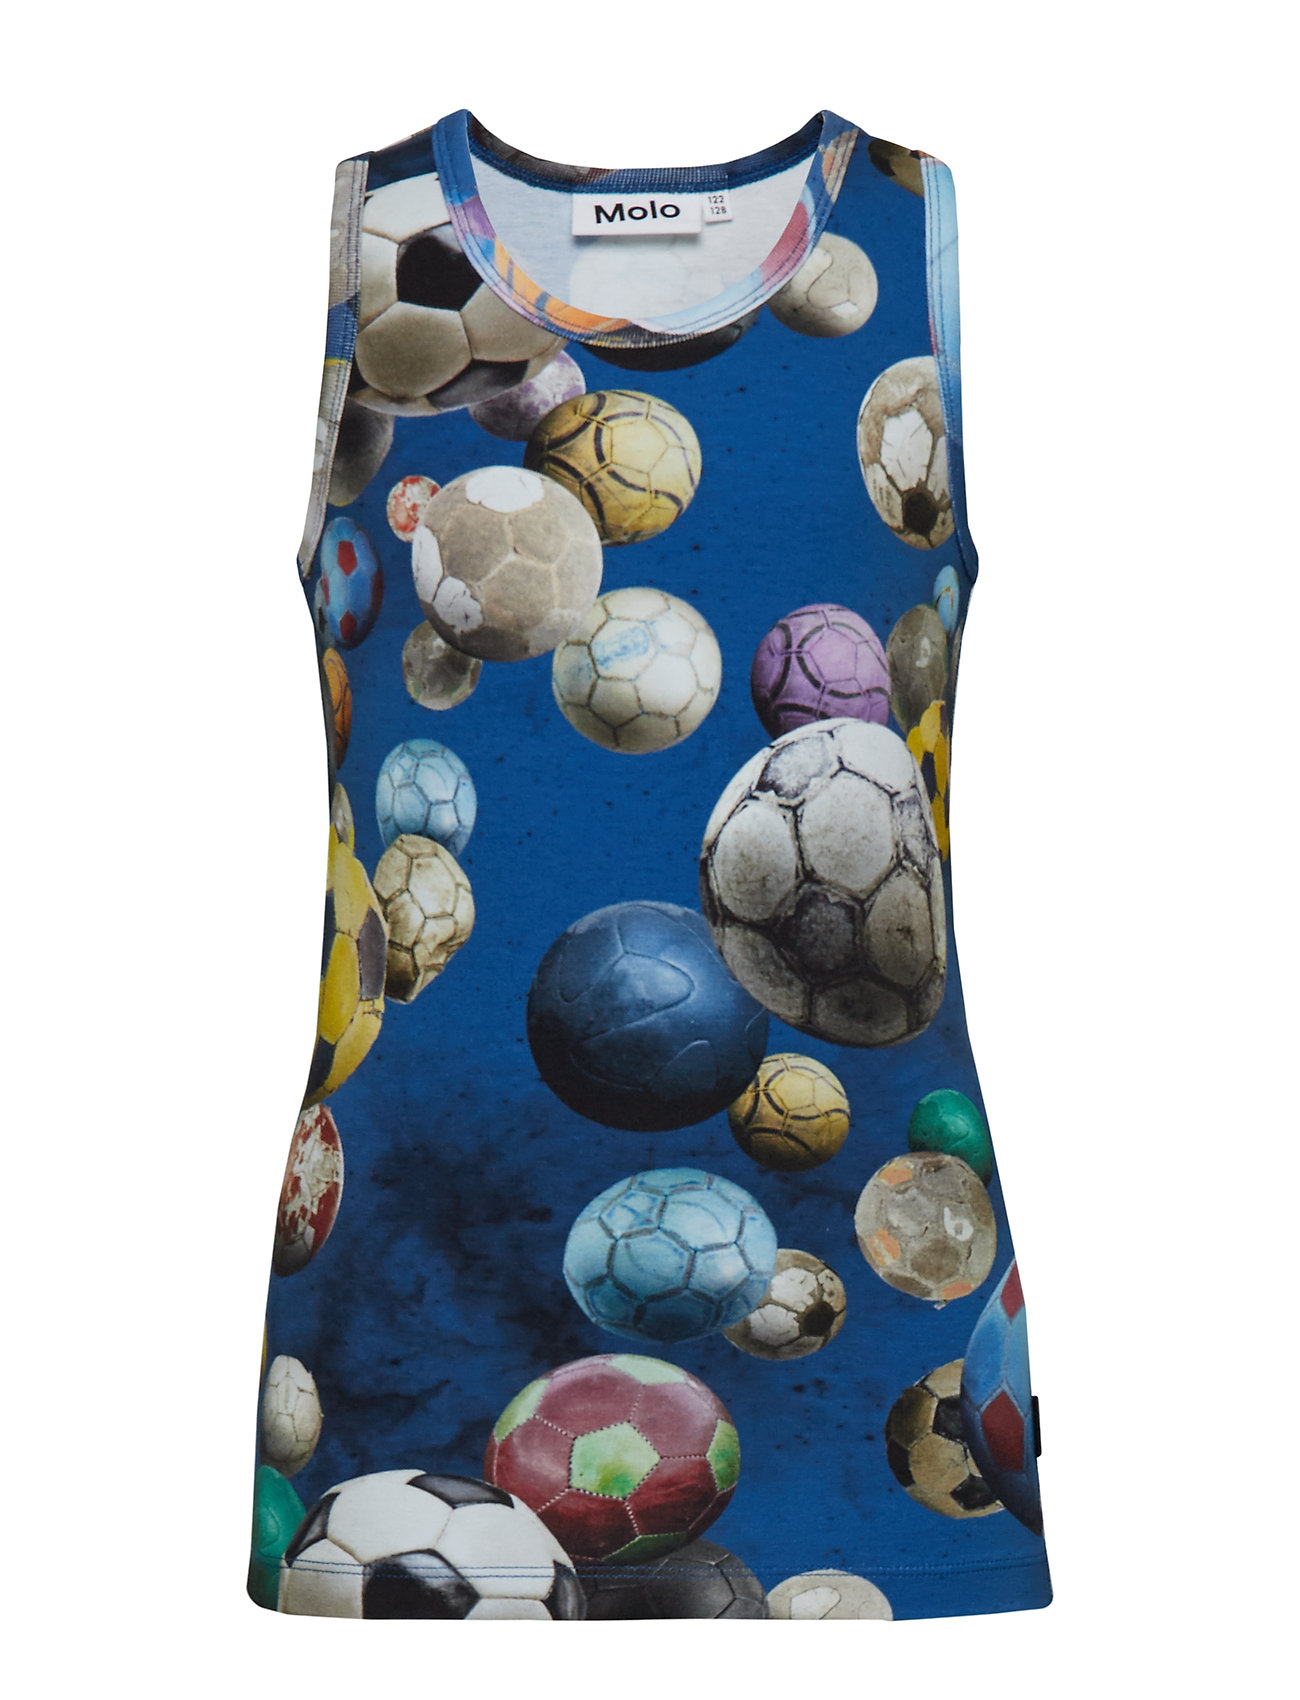 Molo Jim - COSMIC FOOTBALLS